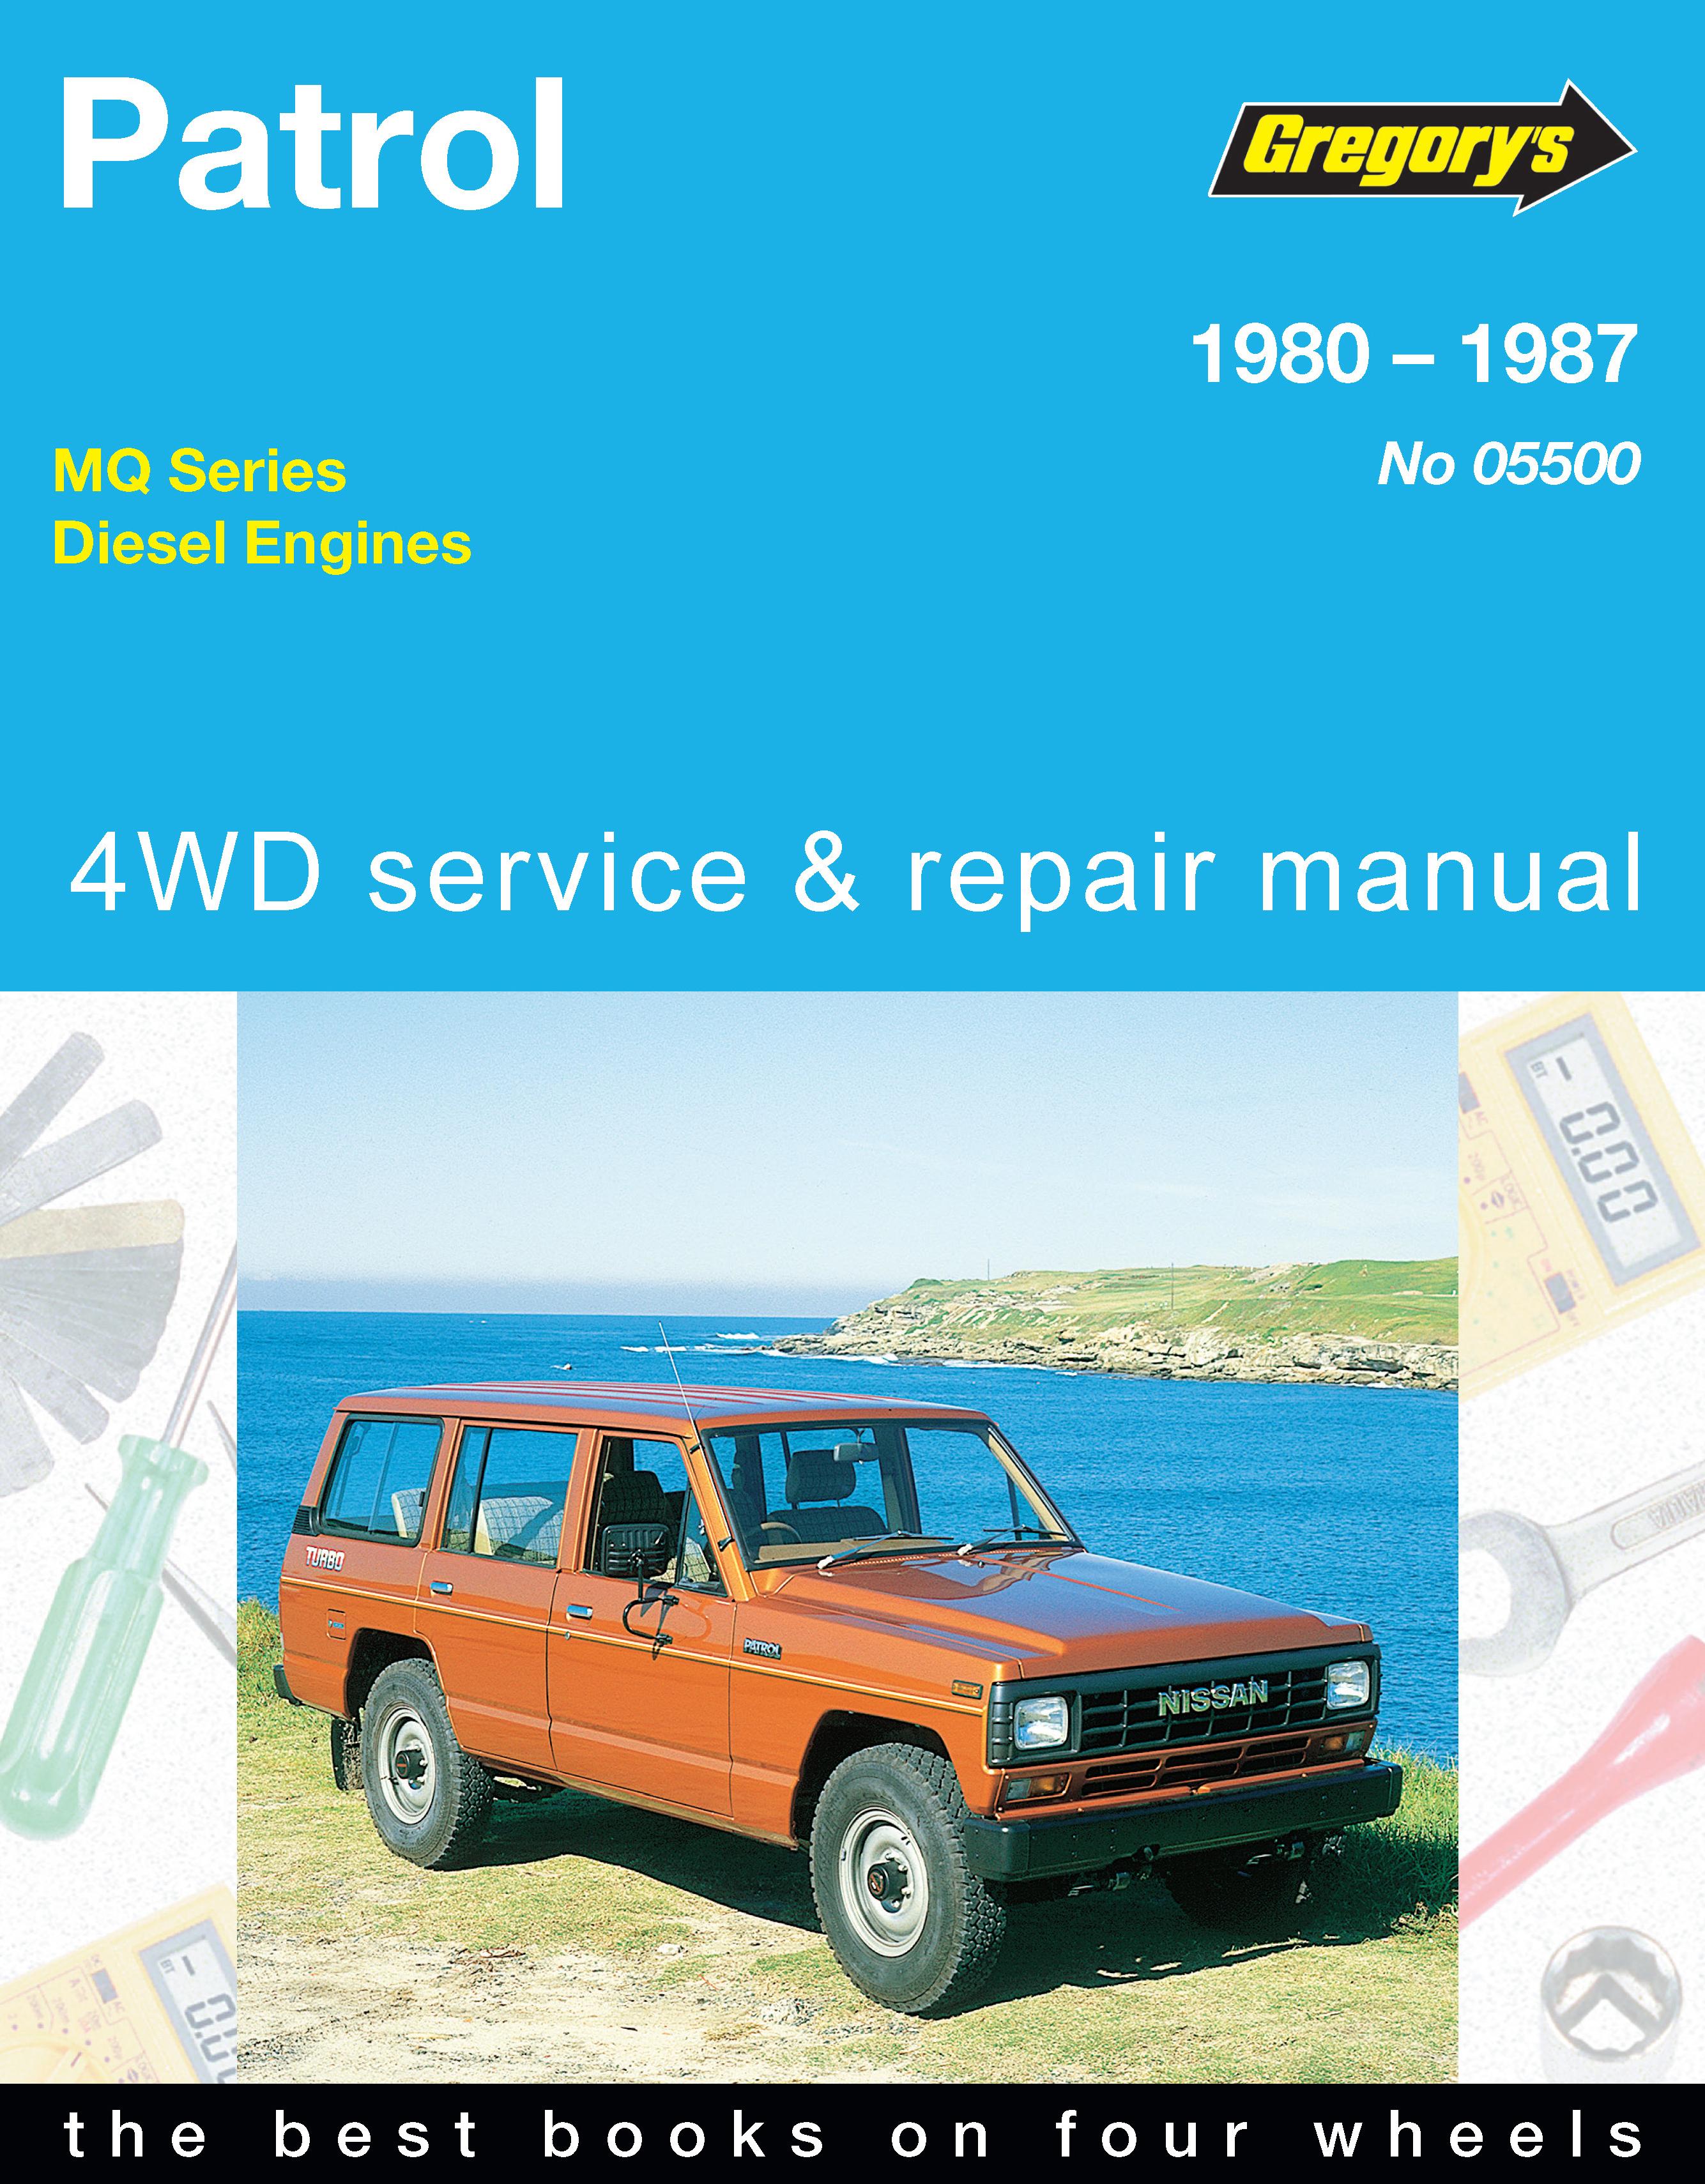 nissan patrol diesel 80 87 gregorys repair manual haynes manuals rh haynes com patrol y61 service manual patrol y61 service manual